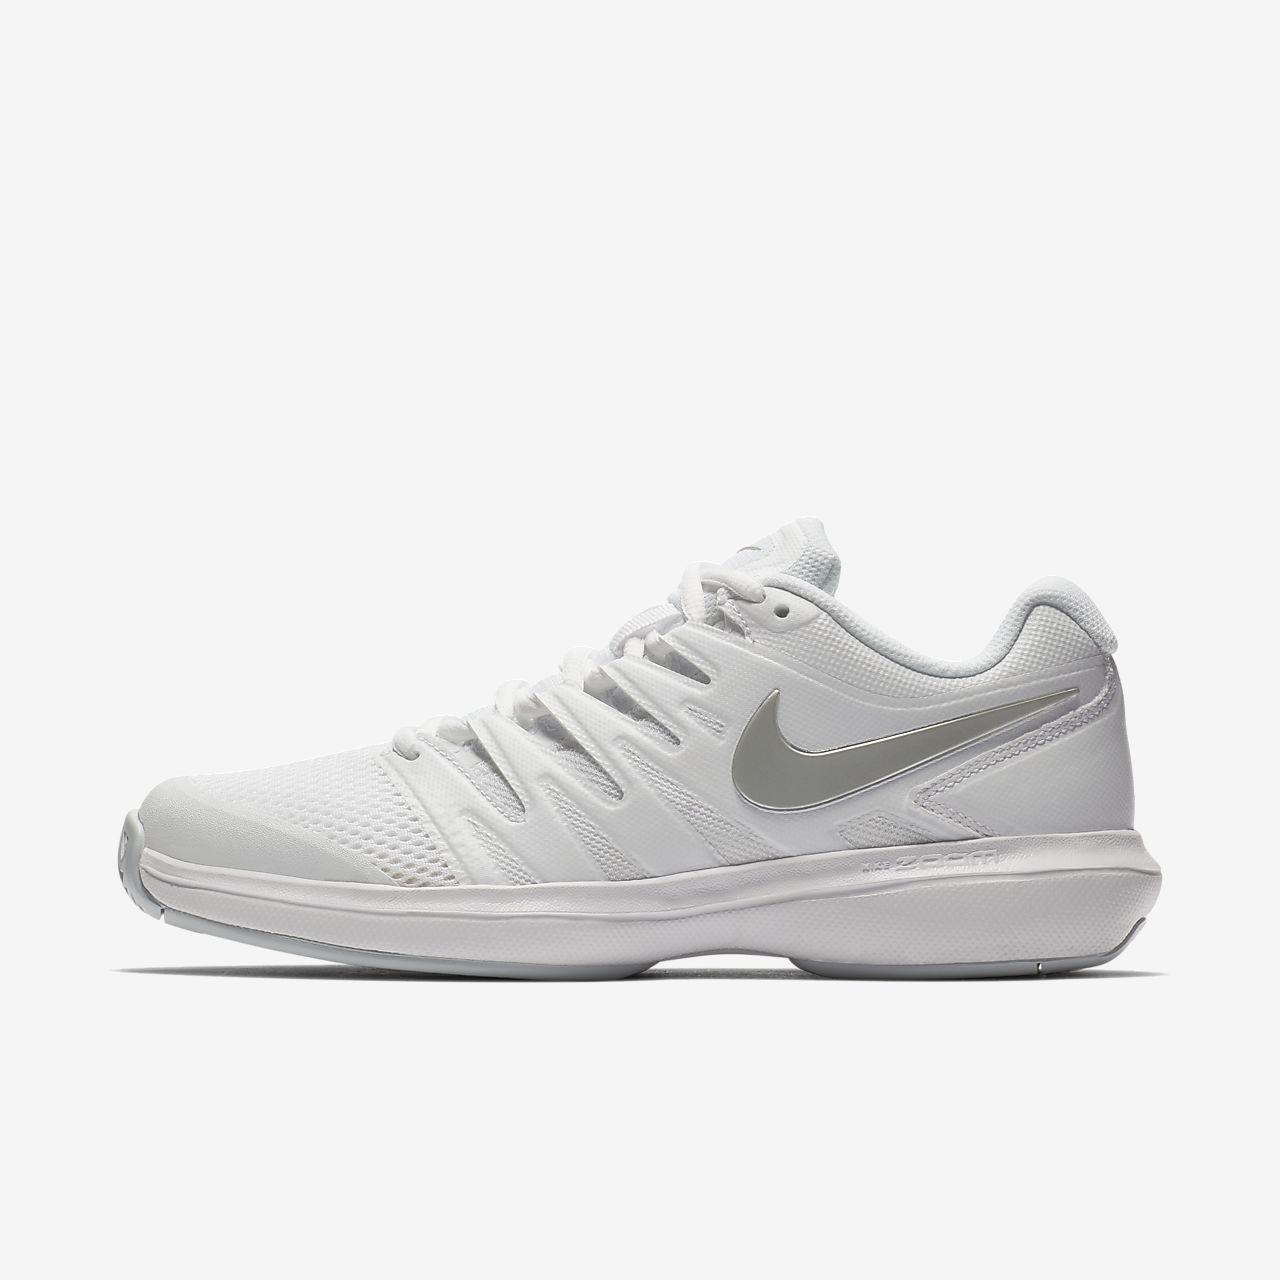 Nike - Air Zoom Prestige Femmes Chaussure de tennis (blanc/Orange) - EU 38 - US 7 w49cH1Pn